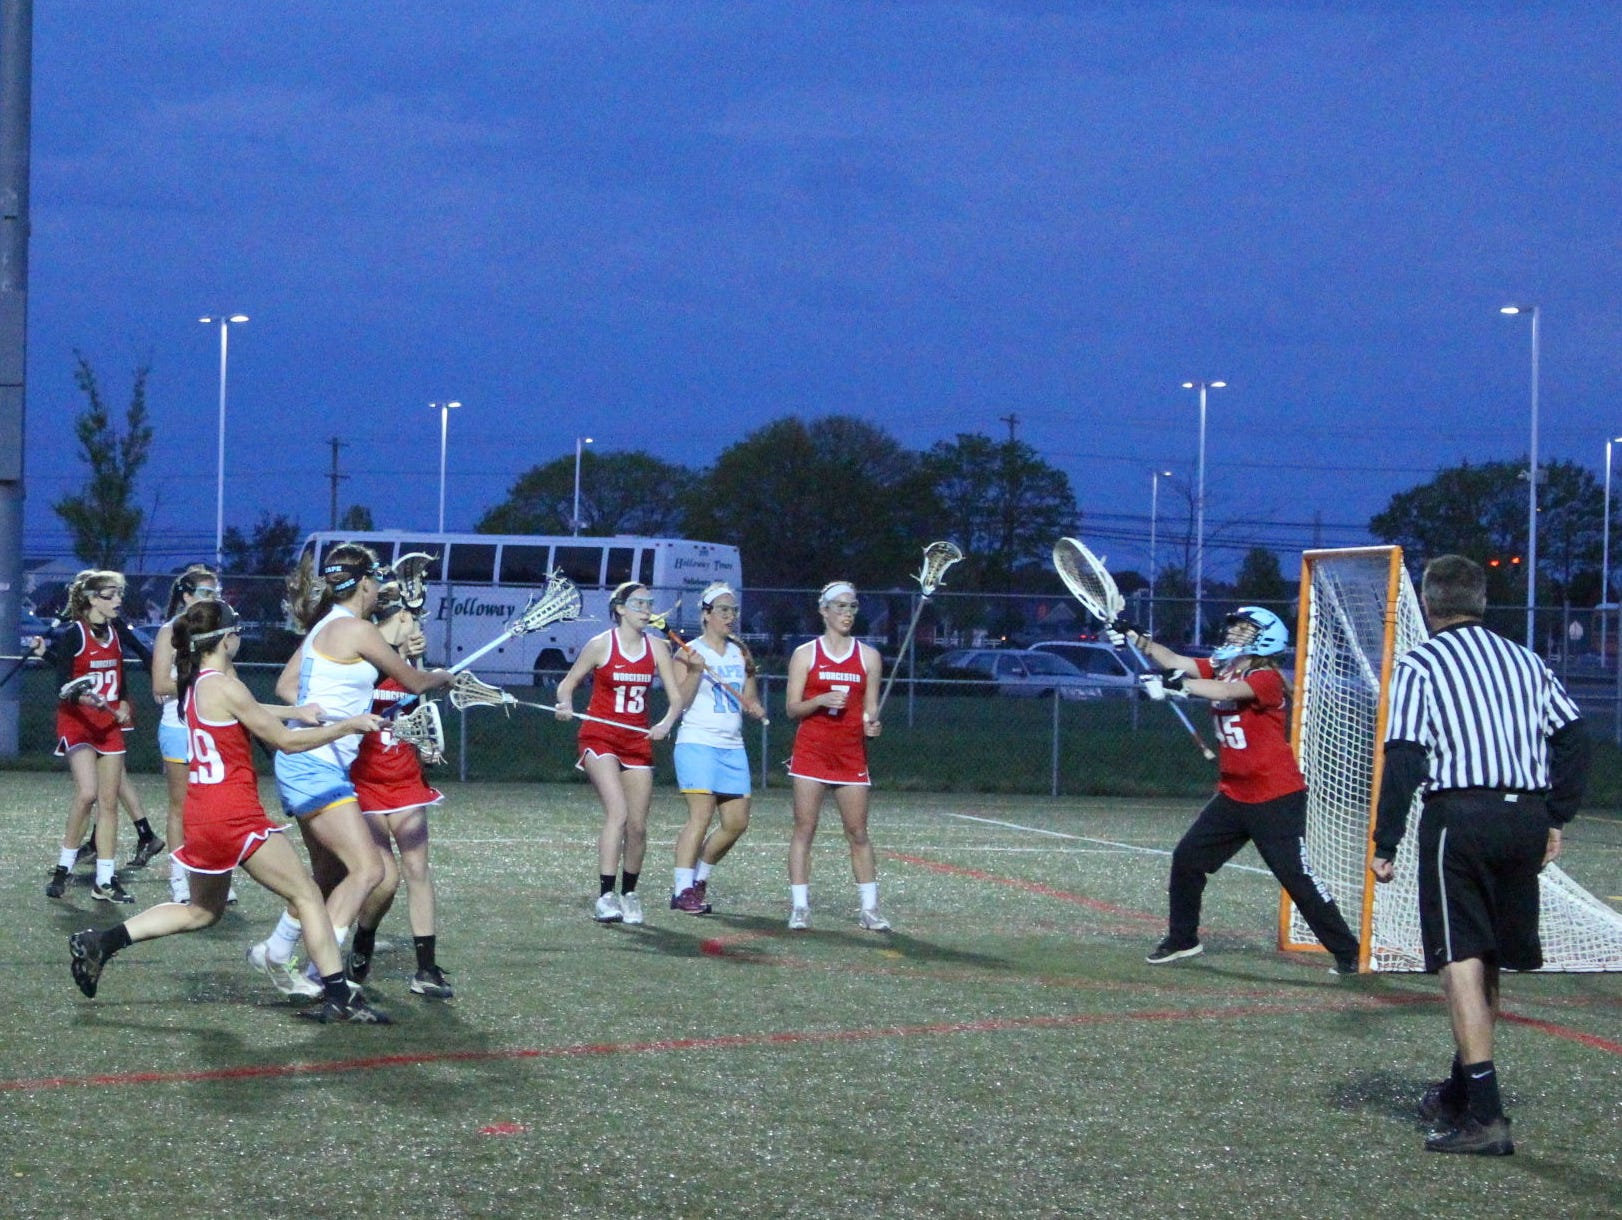 Cape Henlopen Sarah Tappan takes a shot against Worcester Prep.